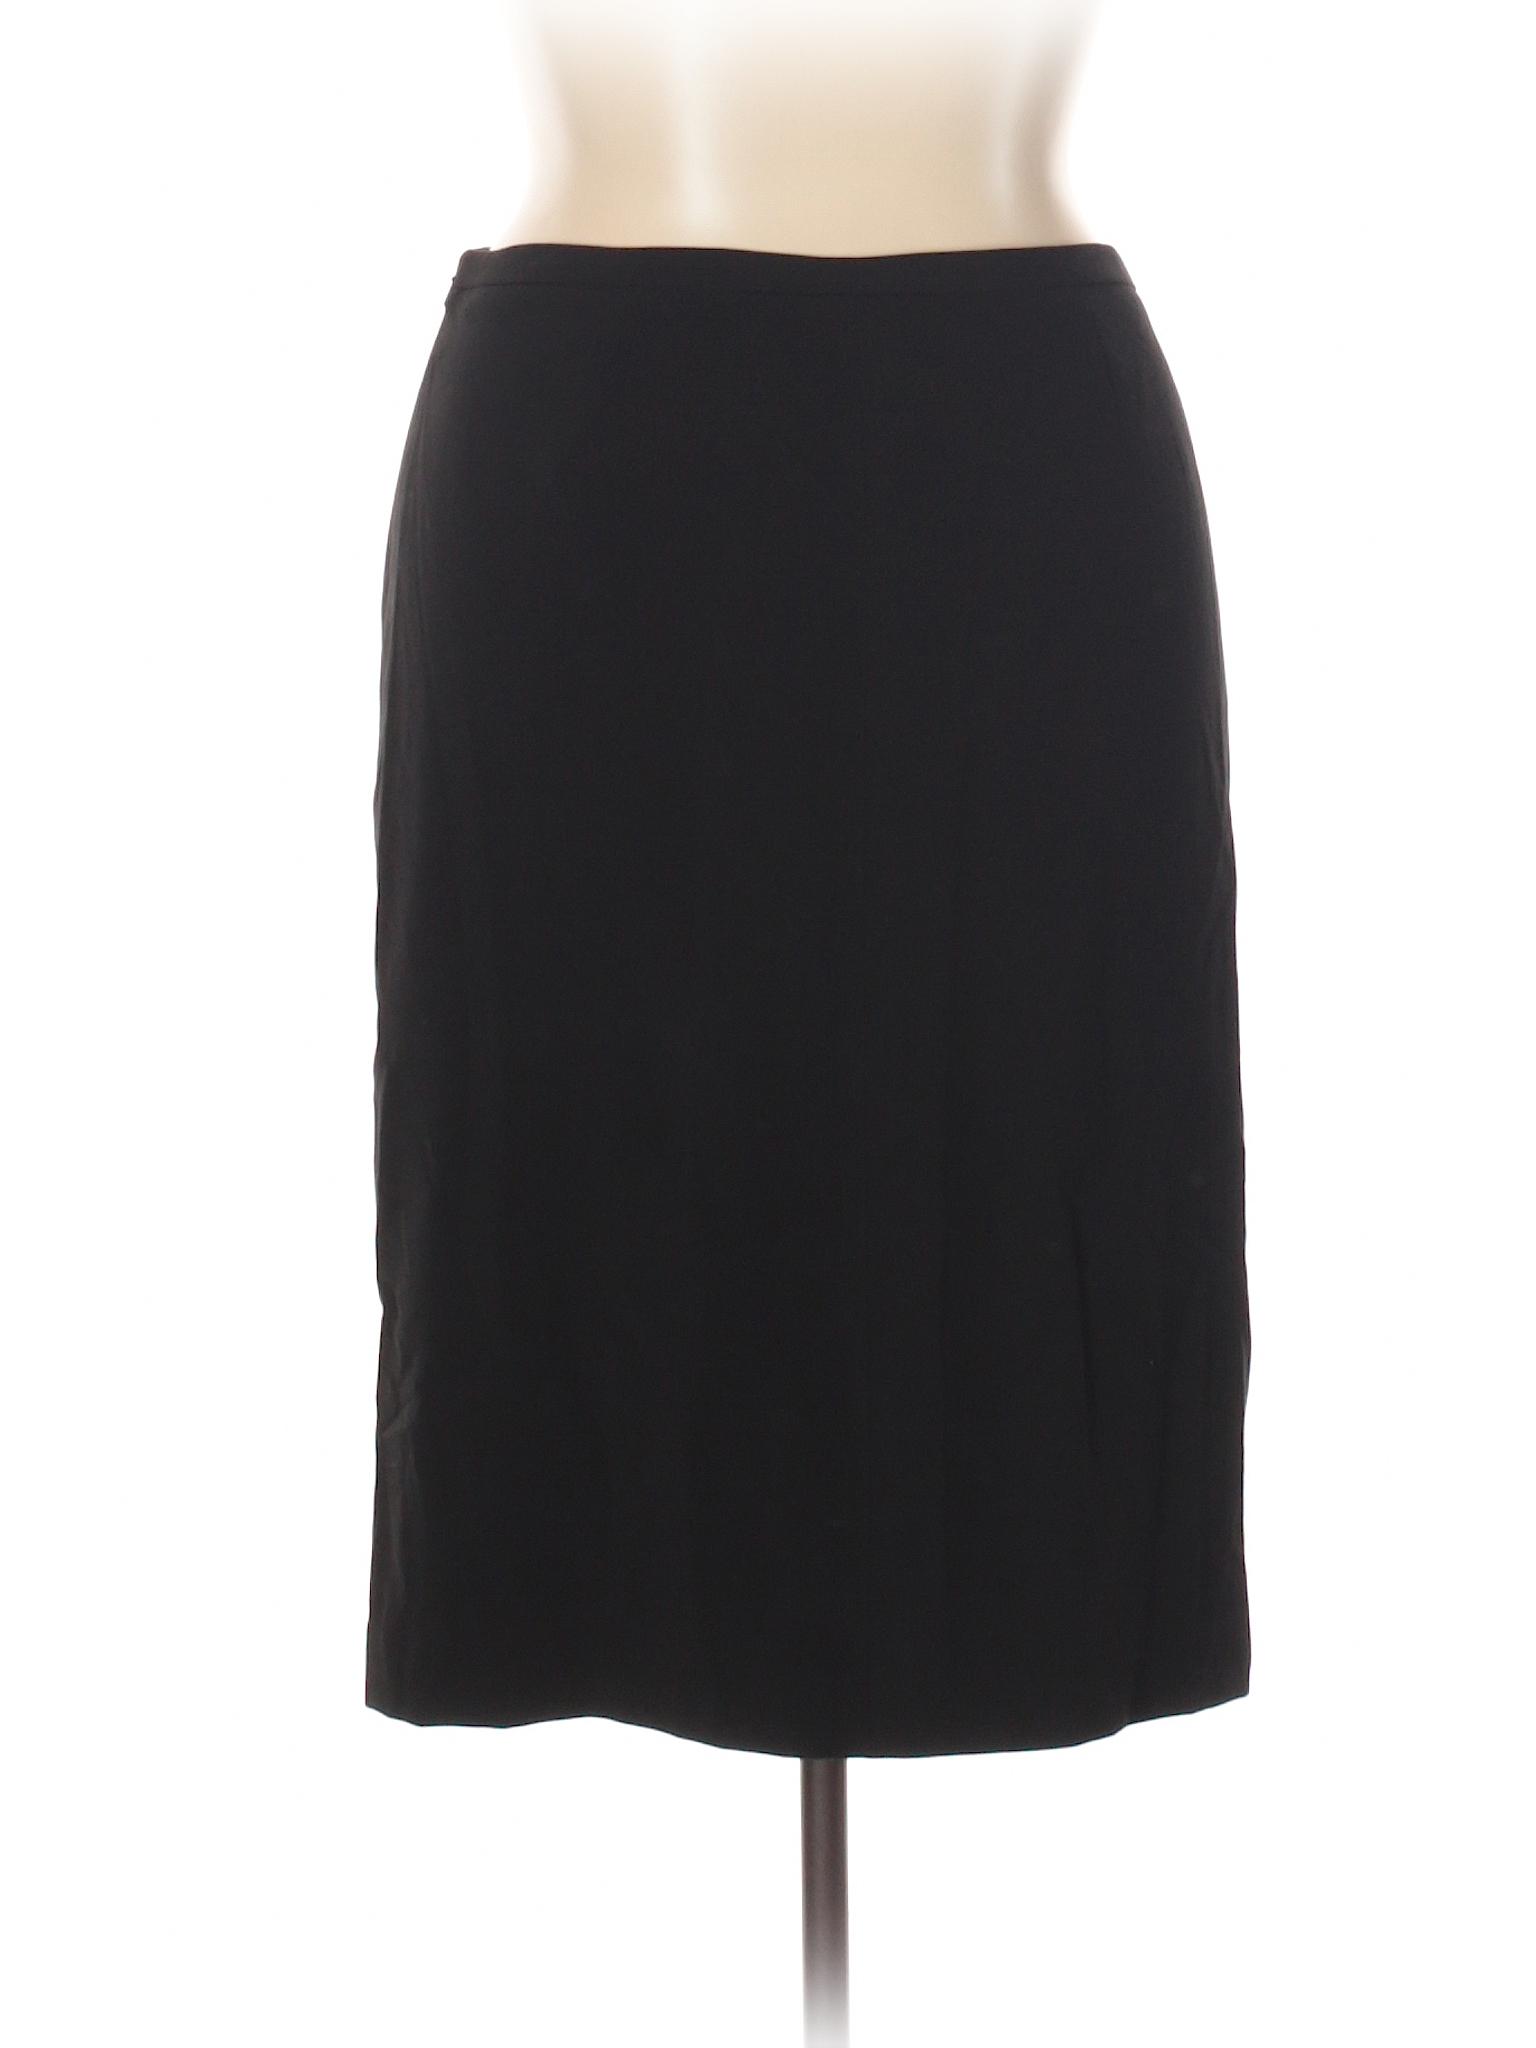 leisure Boutique leisure Casual Boutique Skirt Covington aPxgB4